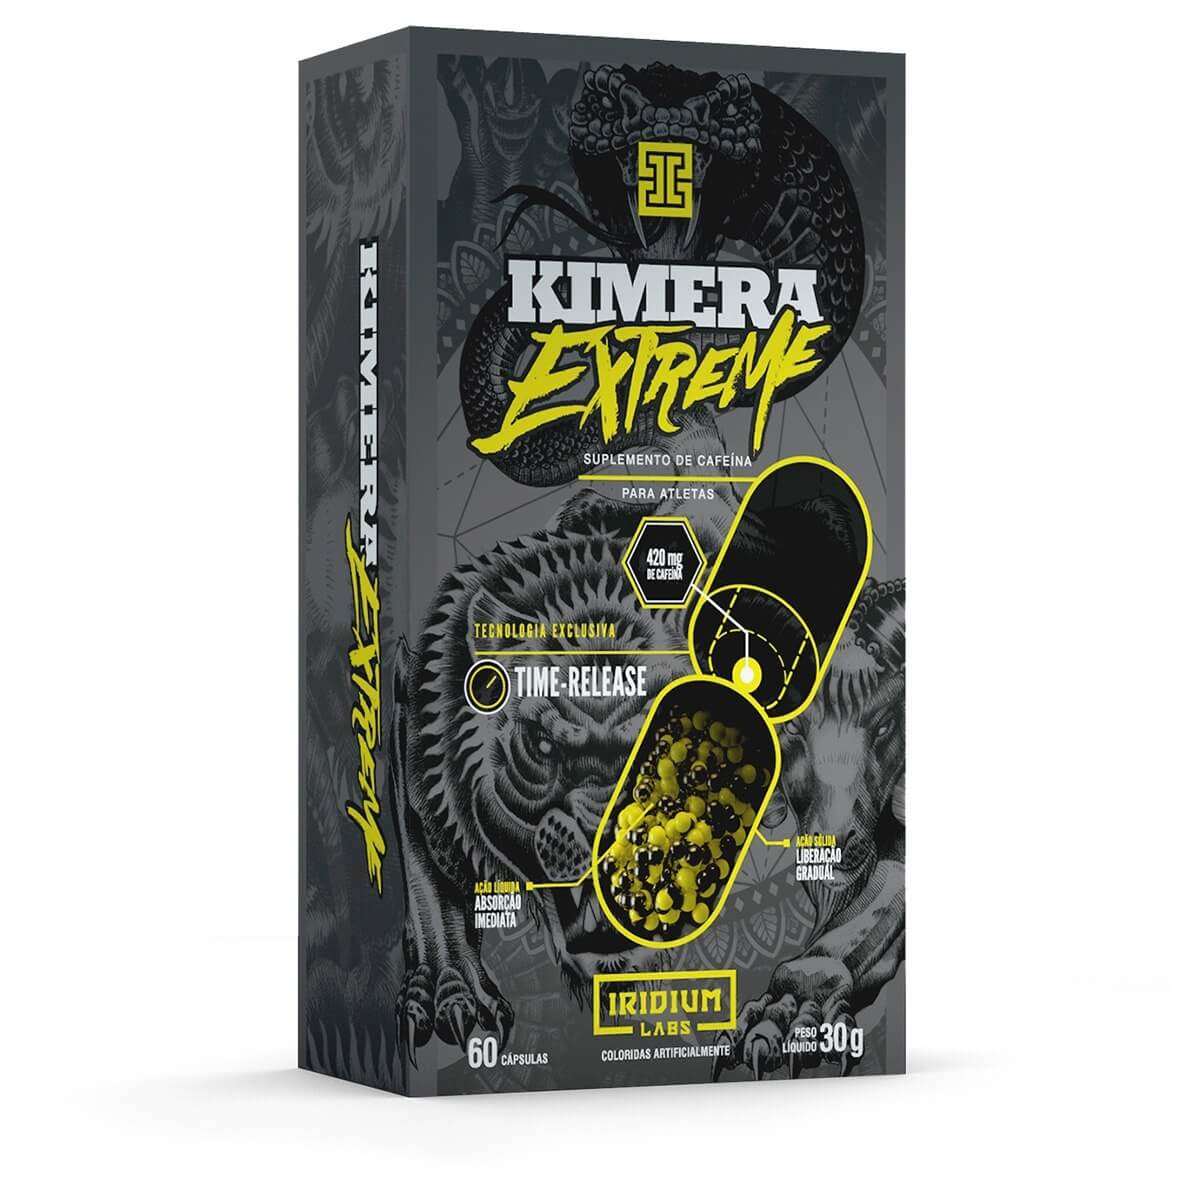 Kimera Extreme 60 cápsulas